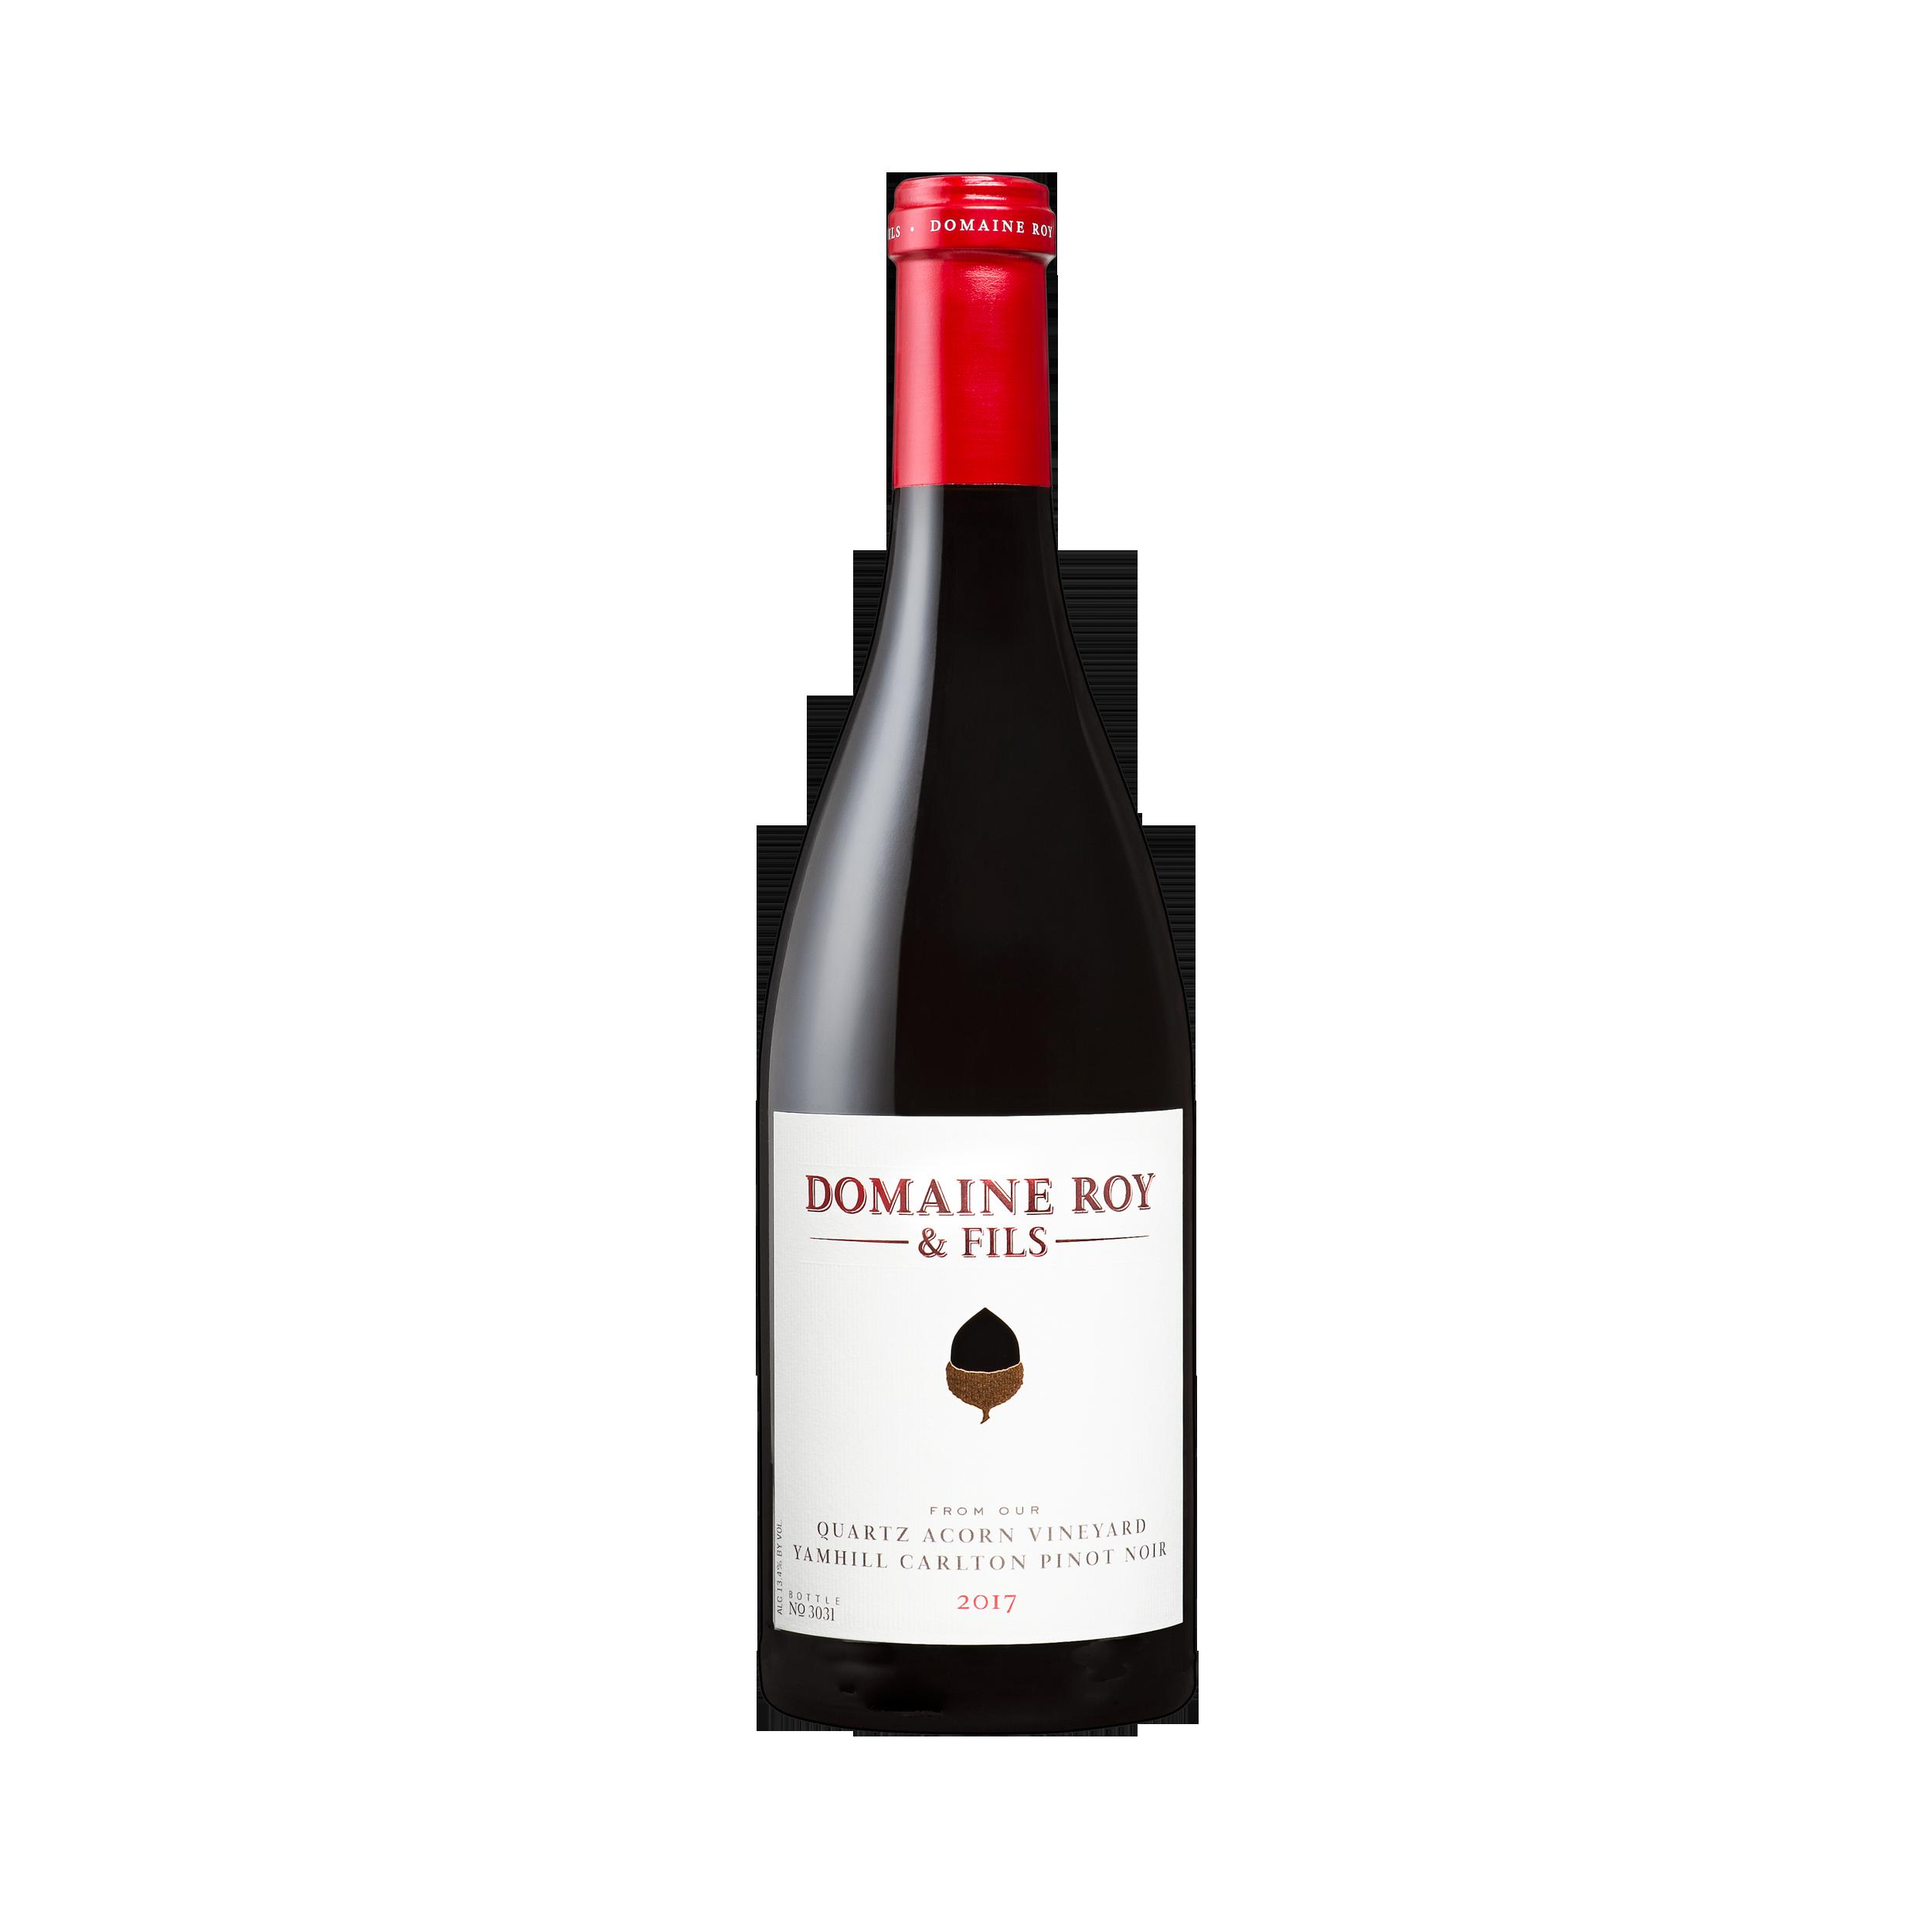 2017 Quartz Acorn Vineyard Pinot Noir